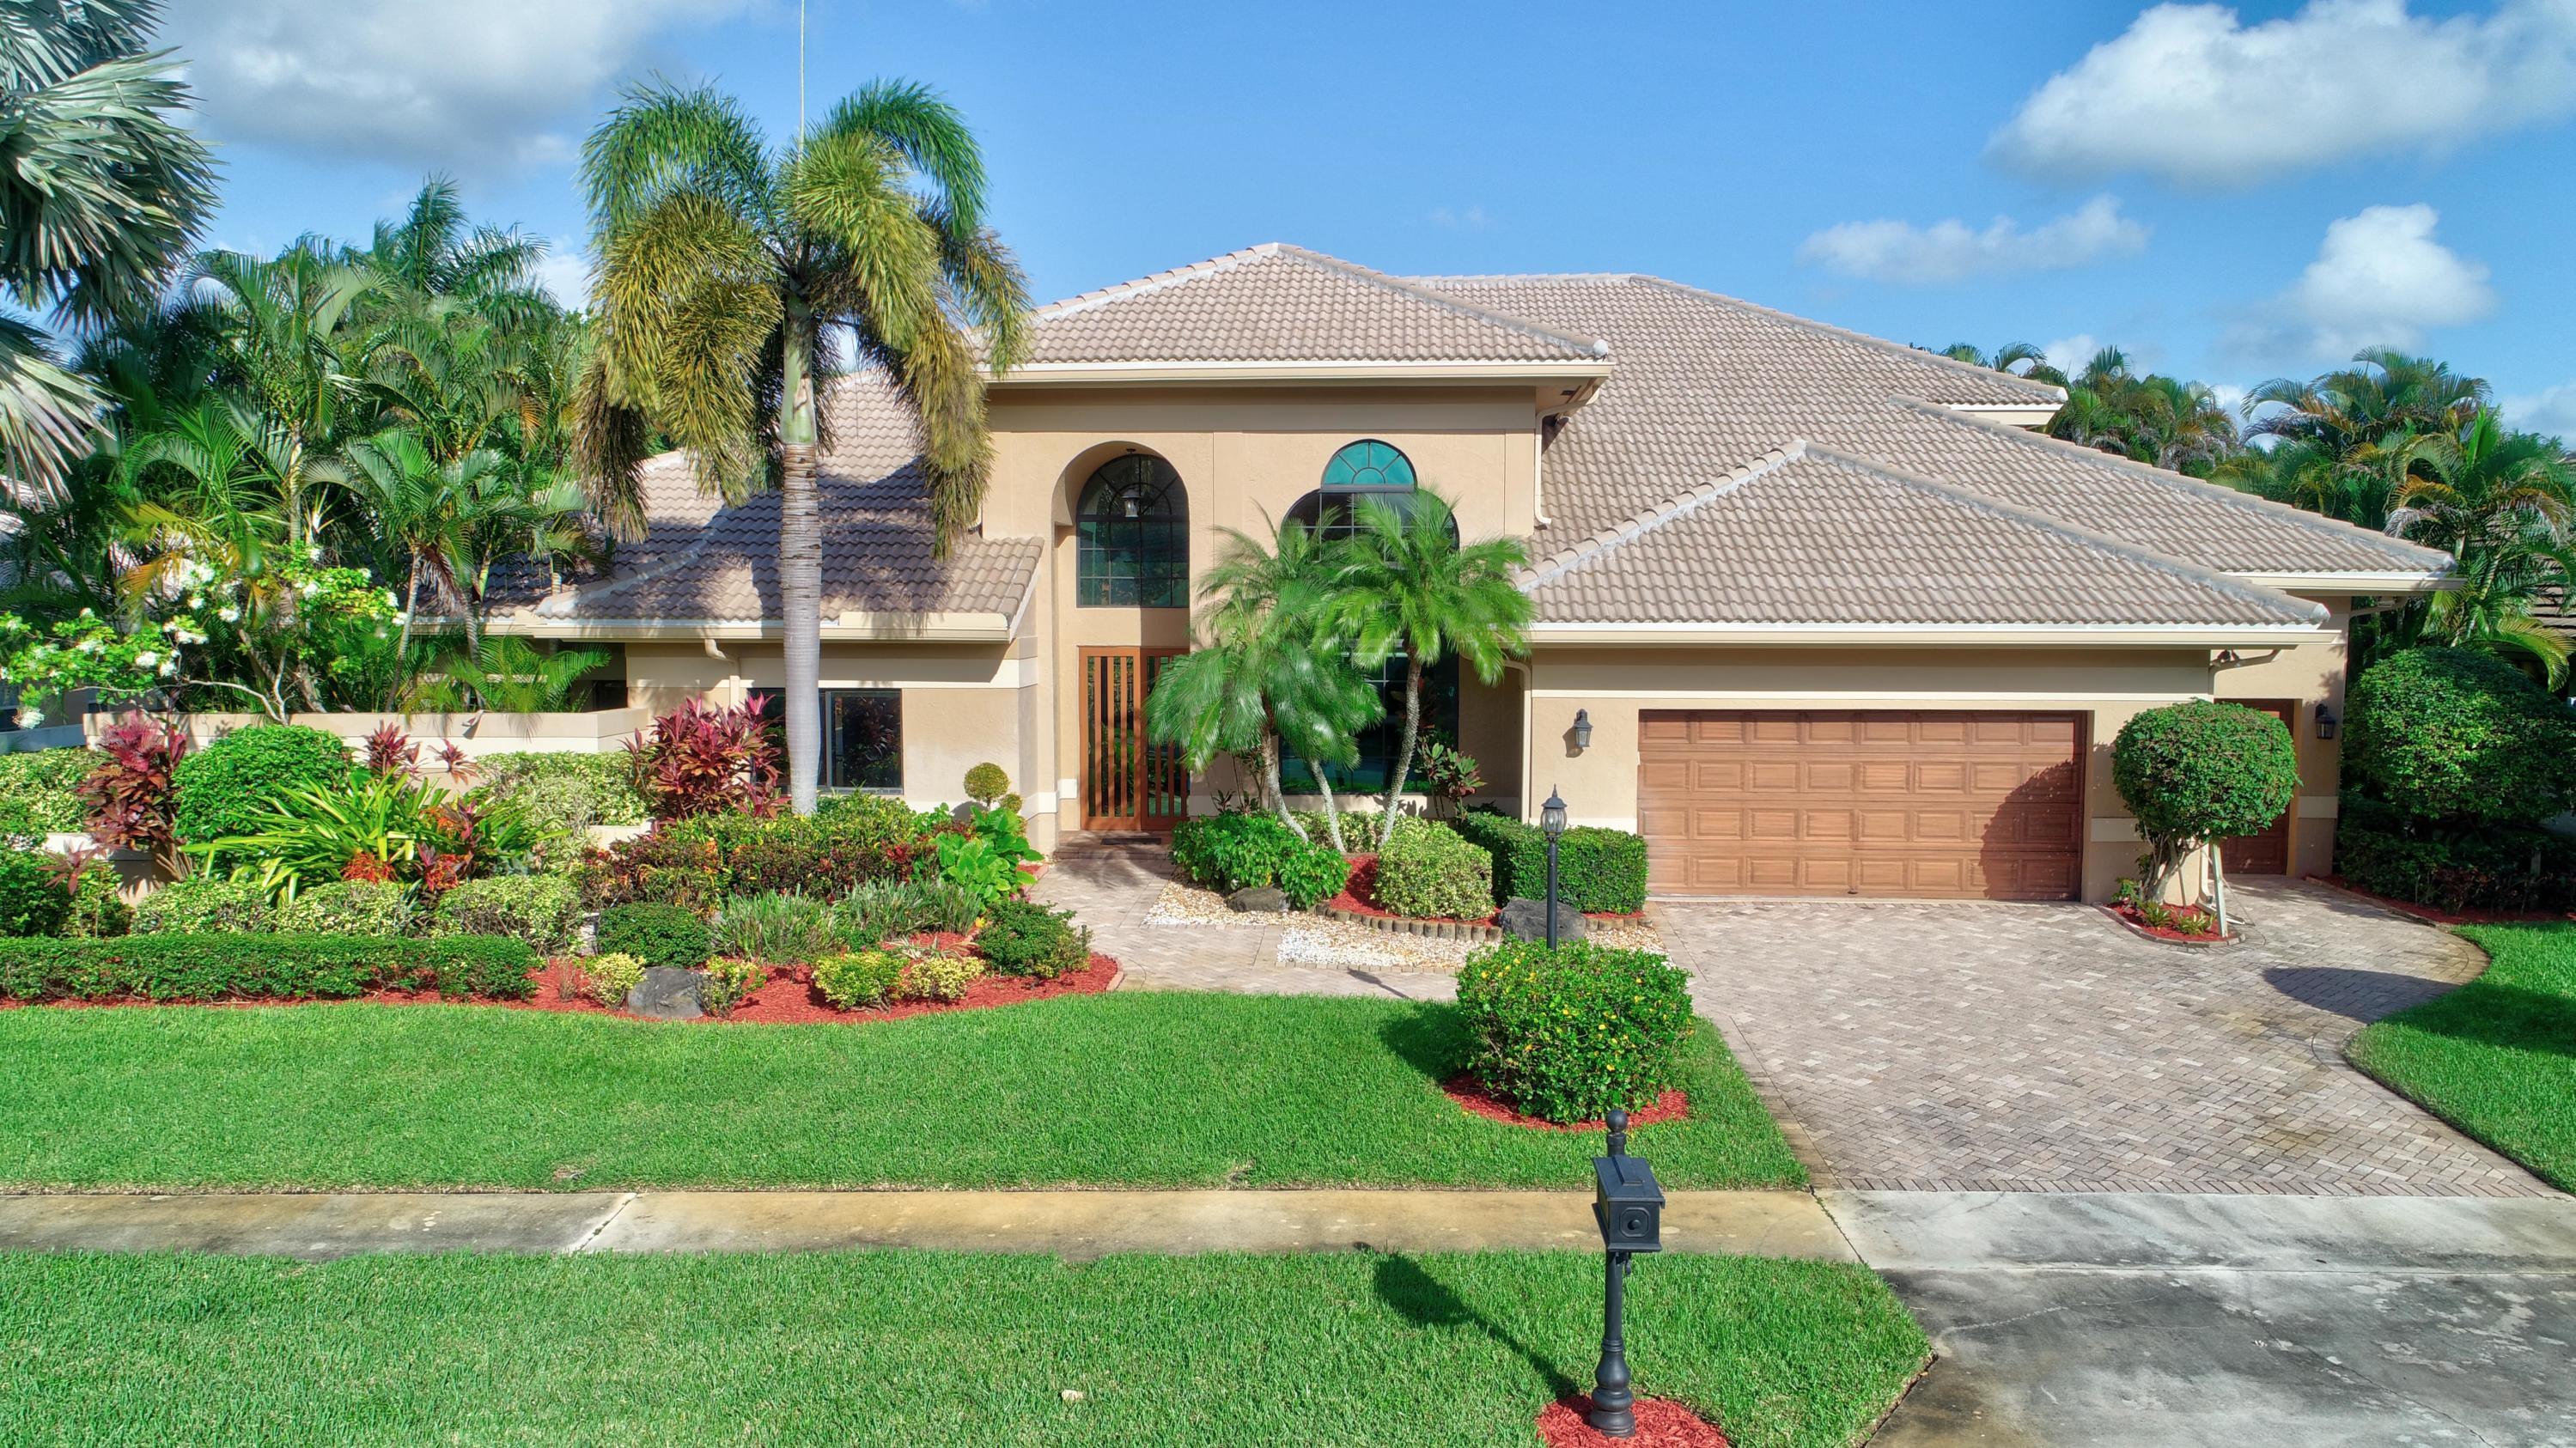 Photo of 10241 Shireoaks Lane, Boca Raton, FL 33498